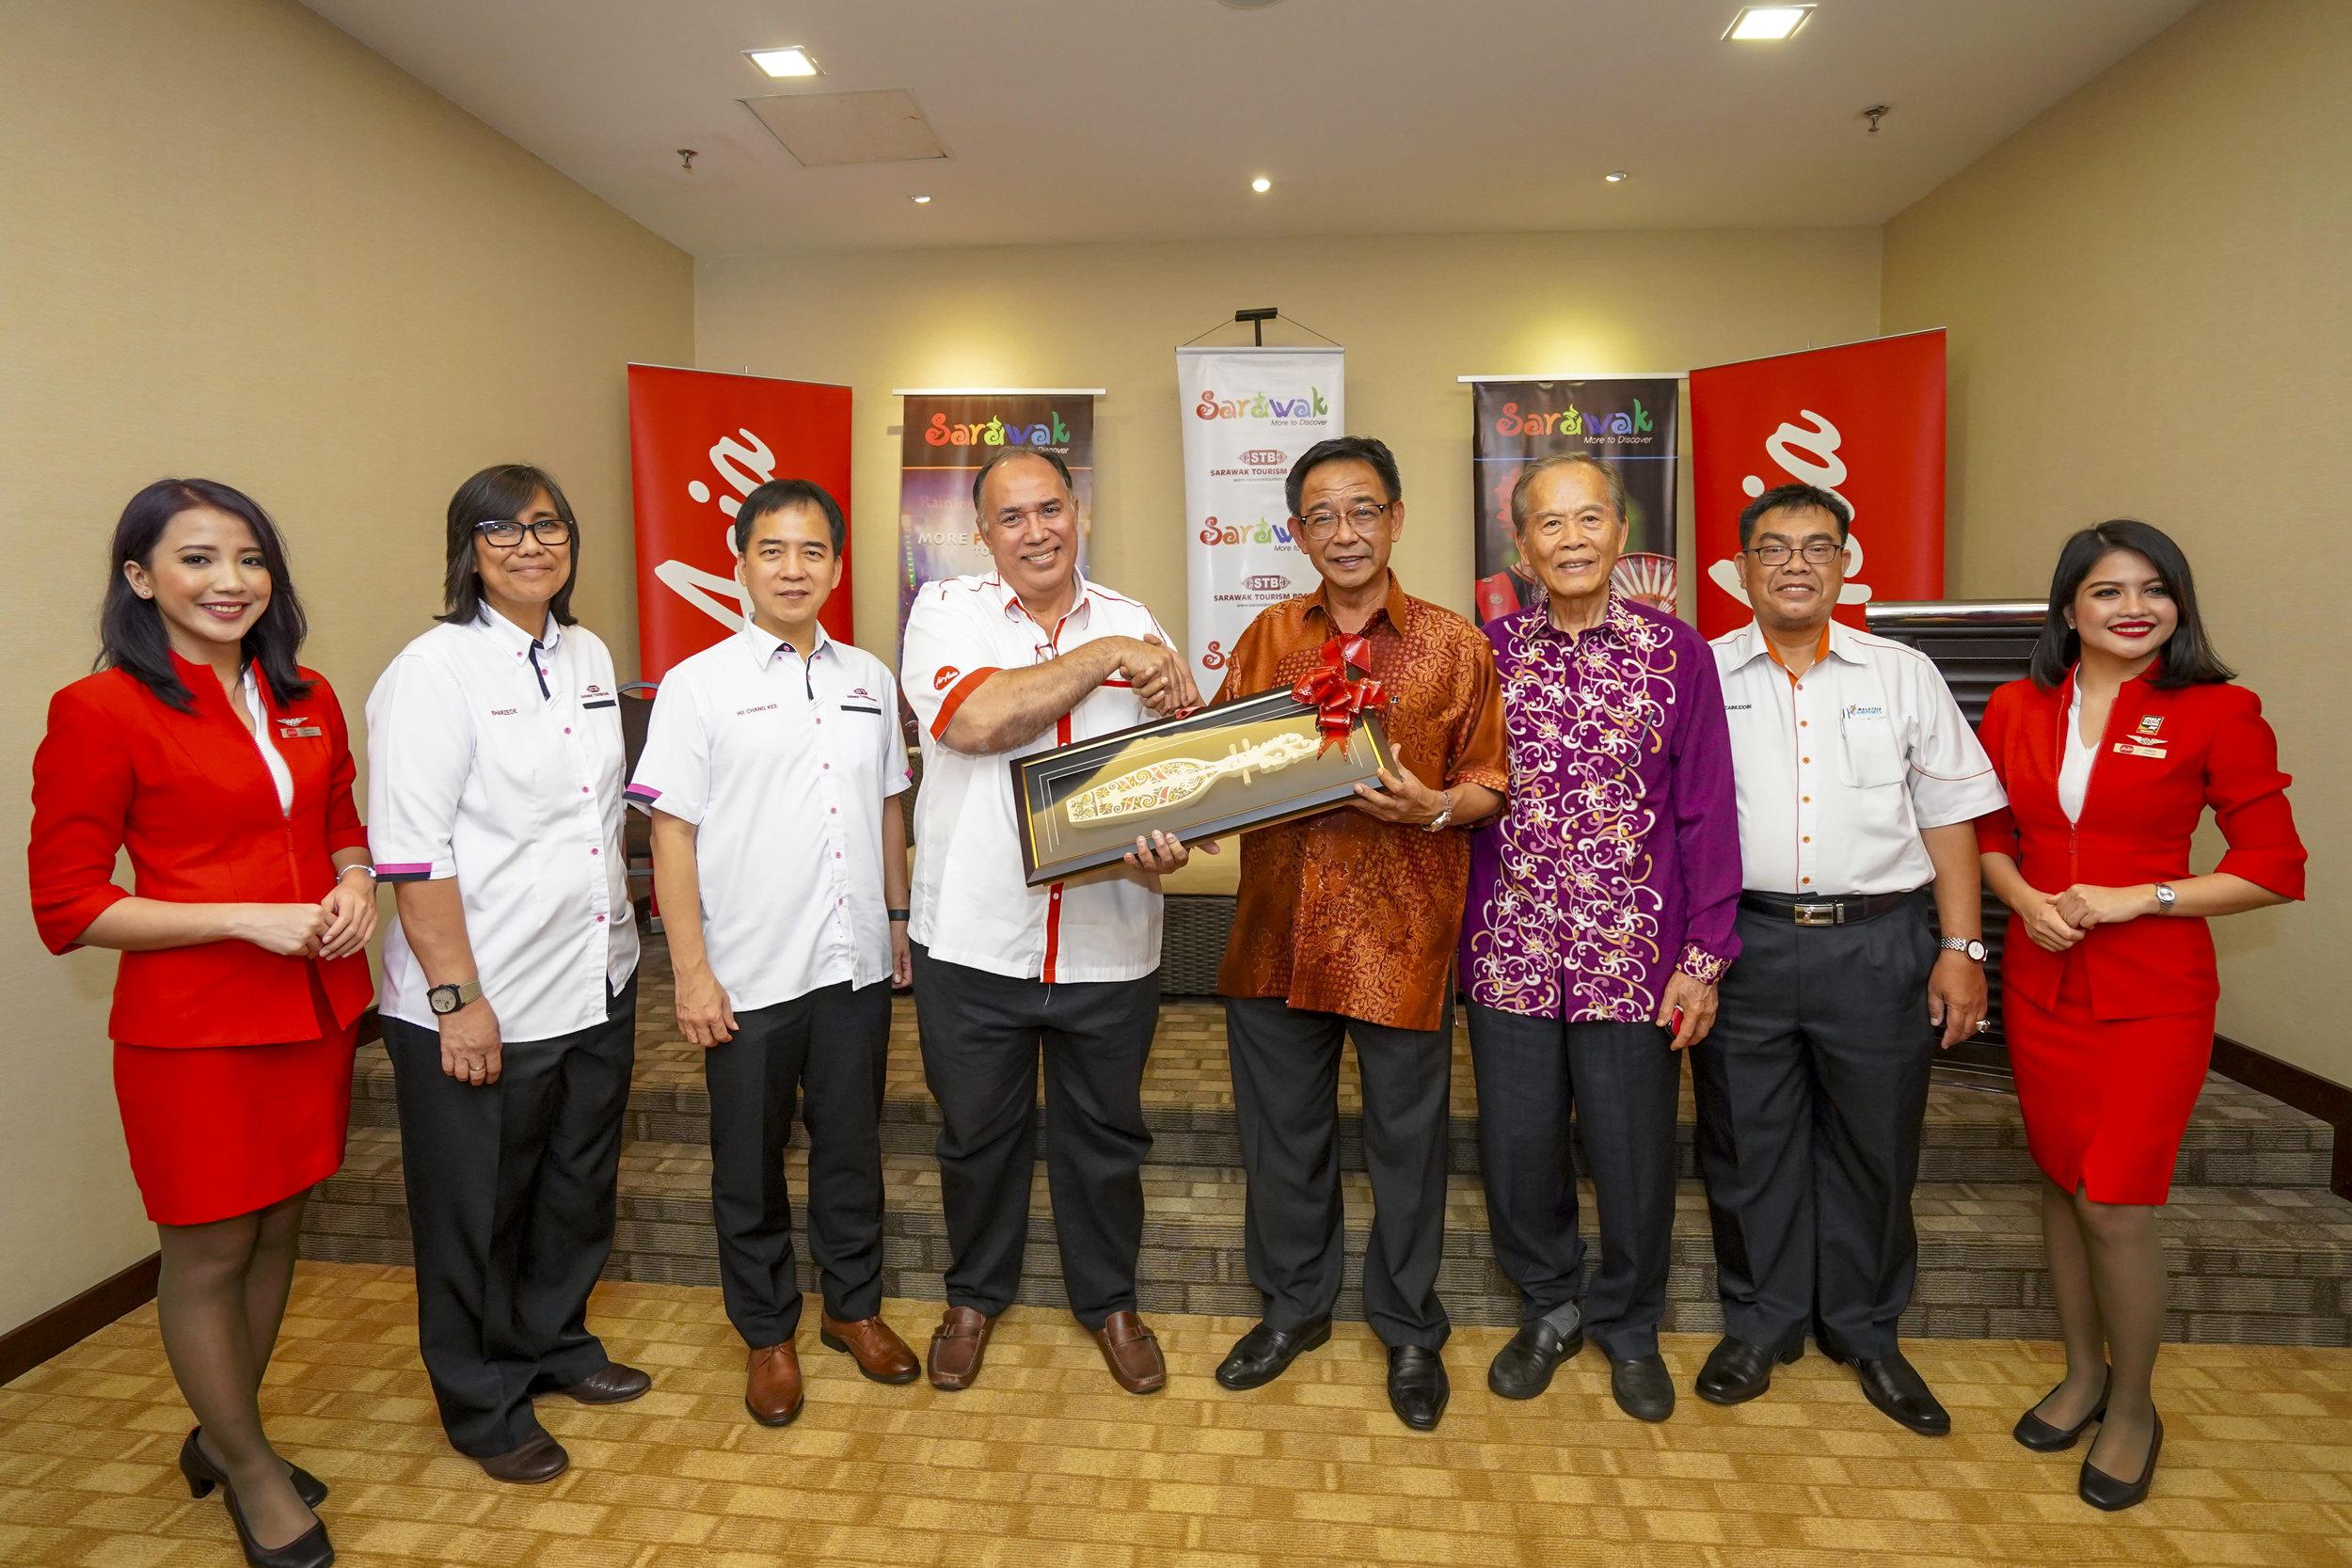 Photo Caption:  (从左至右)砂拉越旅游局首席执行员Puan Sharzede Datu Hj Salleh Askor、旅游、艺术、文化、青年与体育部常务秘书许赞麒、亚航政府关系部总监Zamani Rafique、旅游、艺术、文化、青年与体育部长Datuk Haji Abdul Karim Rahman Hamzah、诗巫市议会主席兼都东区州议员拿督张泰卿及马来西亚机场诗巫经理Zainudin Abdul Nasir 出席发布会。